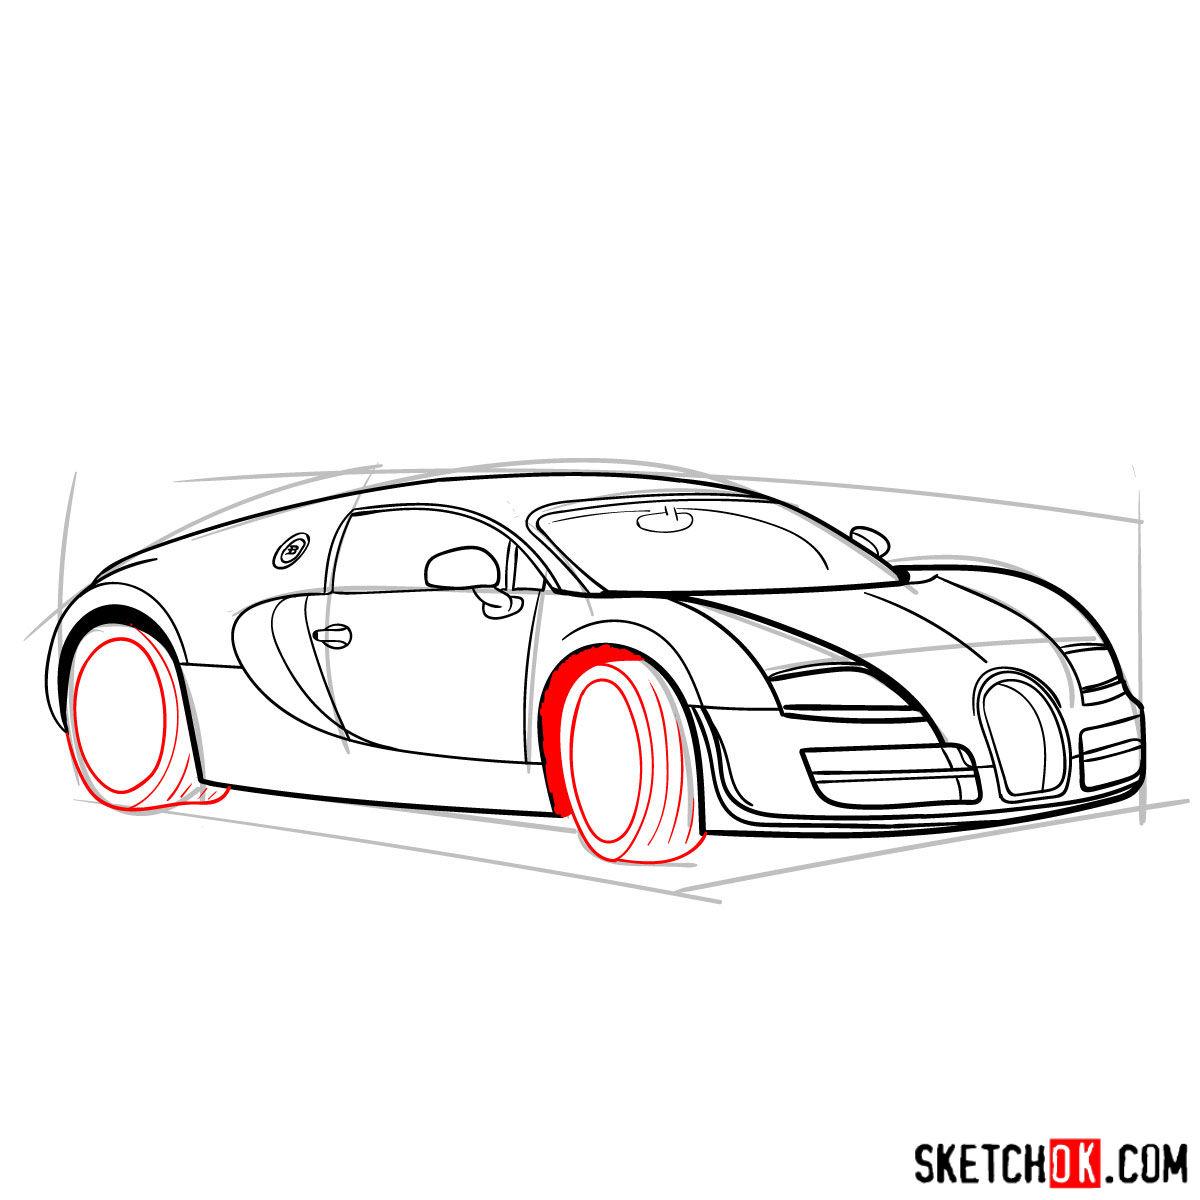 How to draw Bugatti Veyron 16.4 Super Sport - step 11